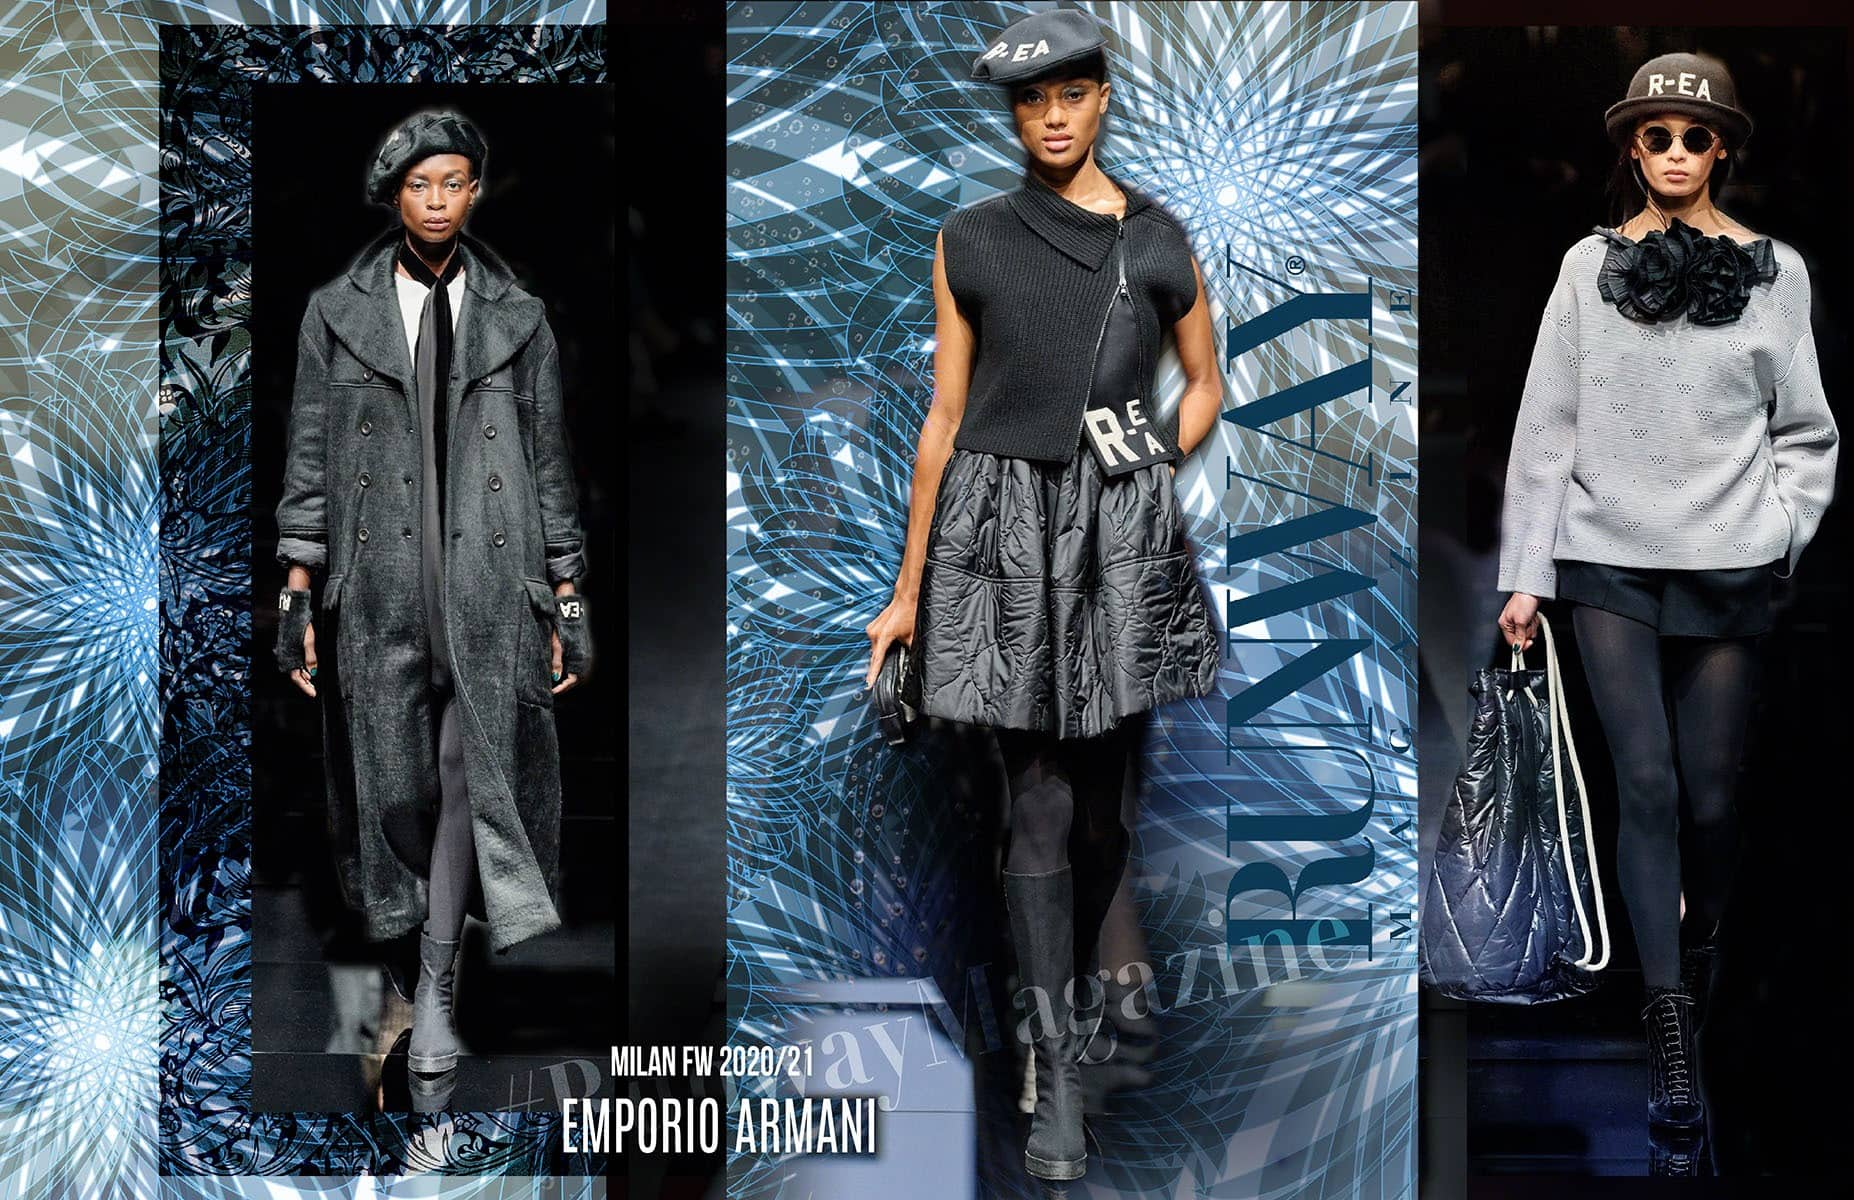 Emporio Armani Fall-Winter 2020-2021 Milan by RUNWAY MAGAZINE